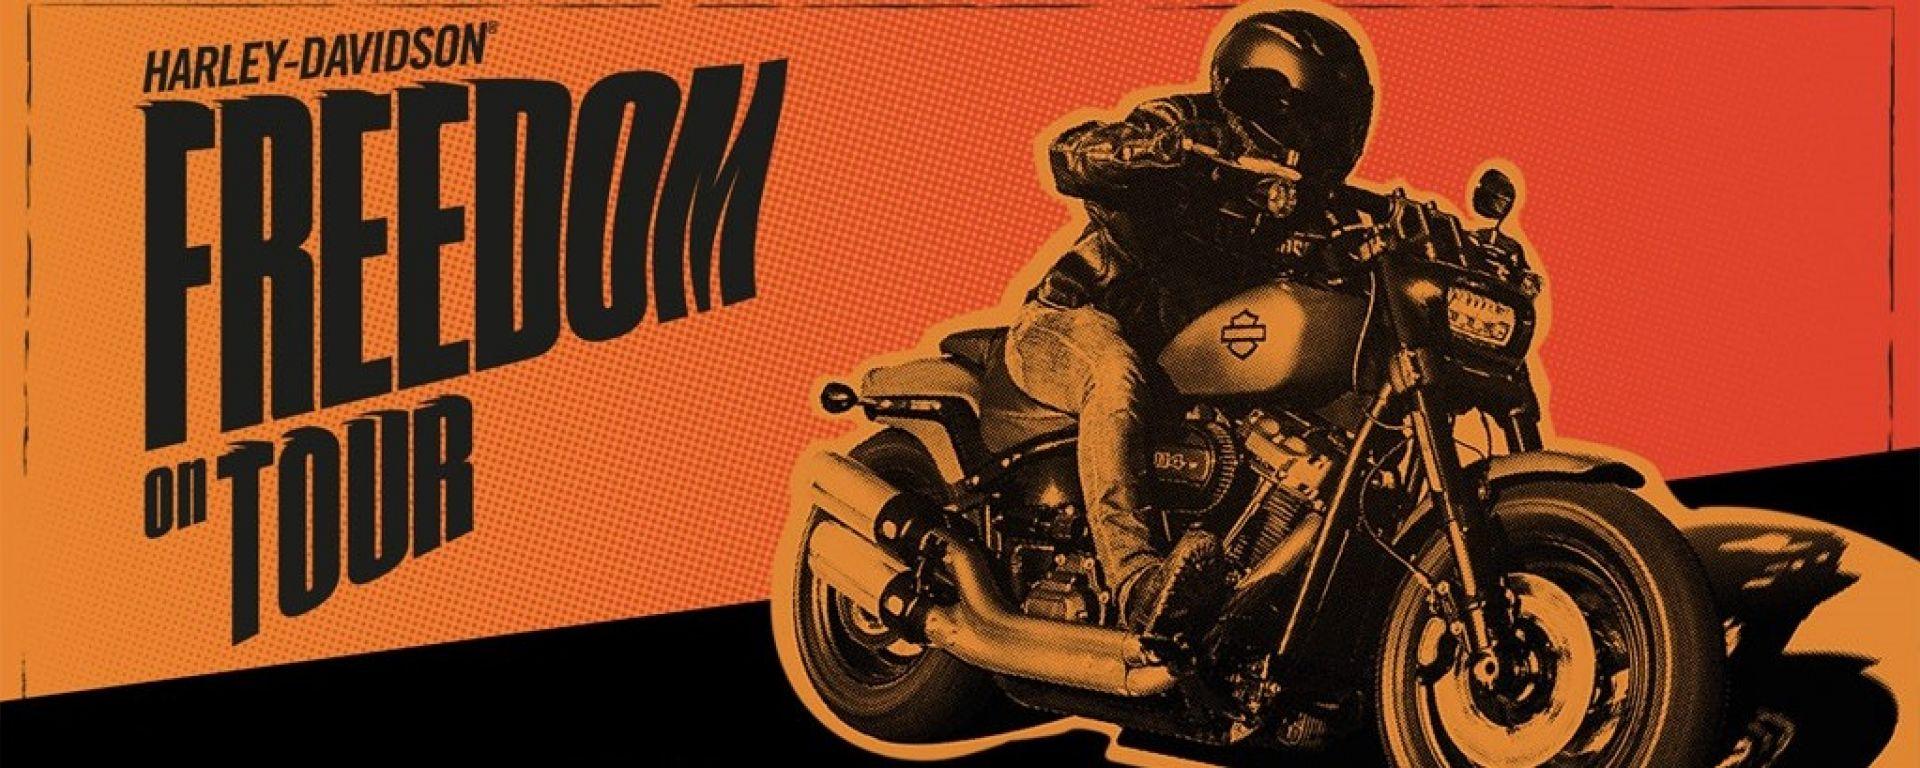 Harley Davidson Freedom on Tour 2018